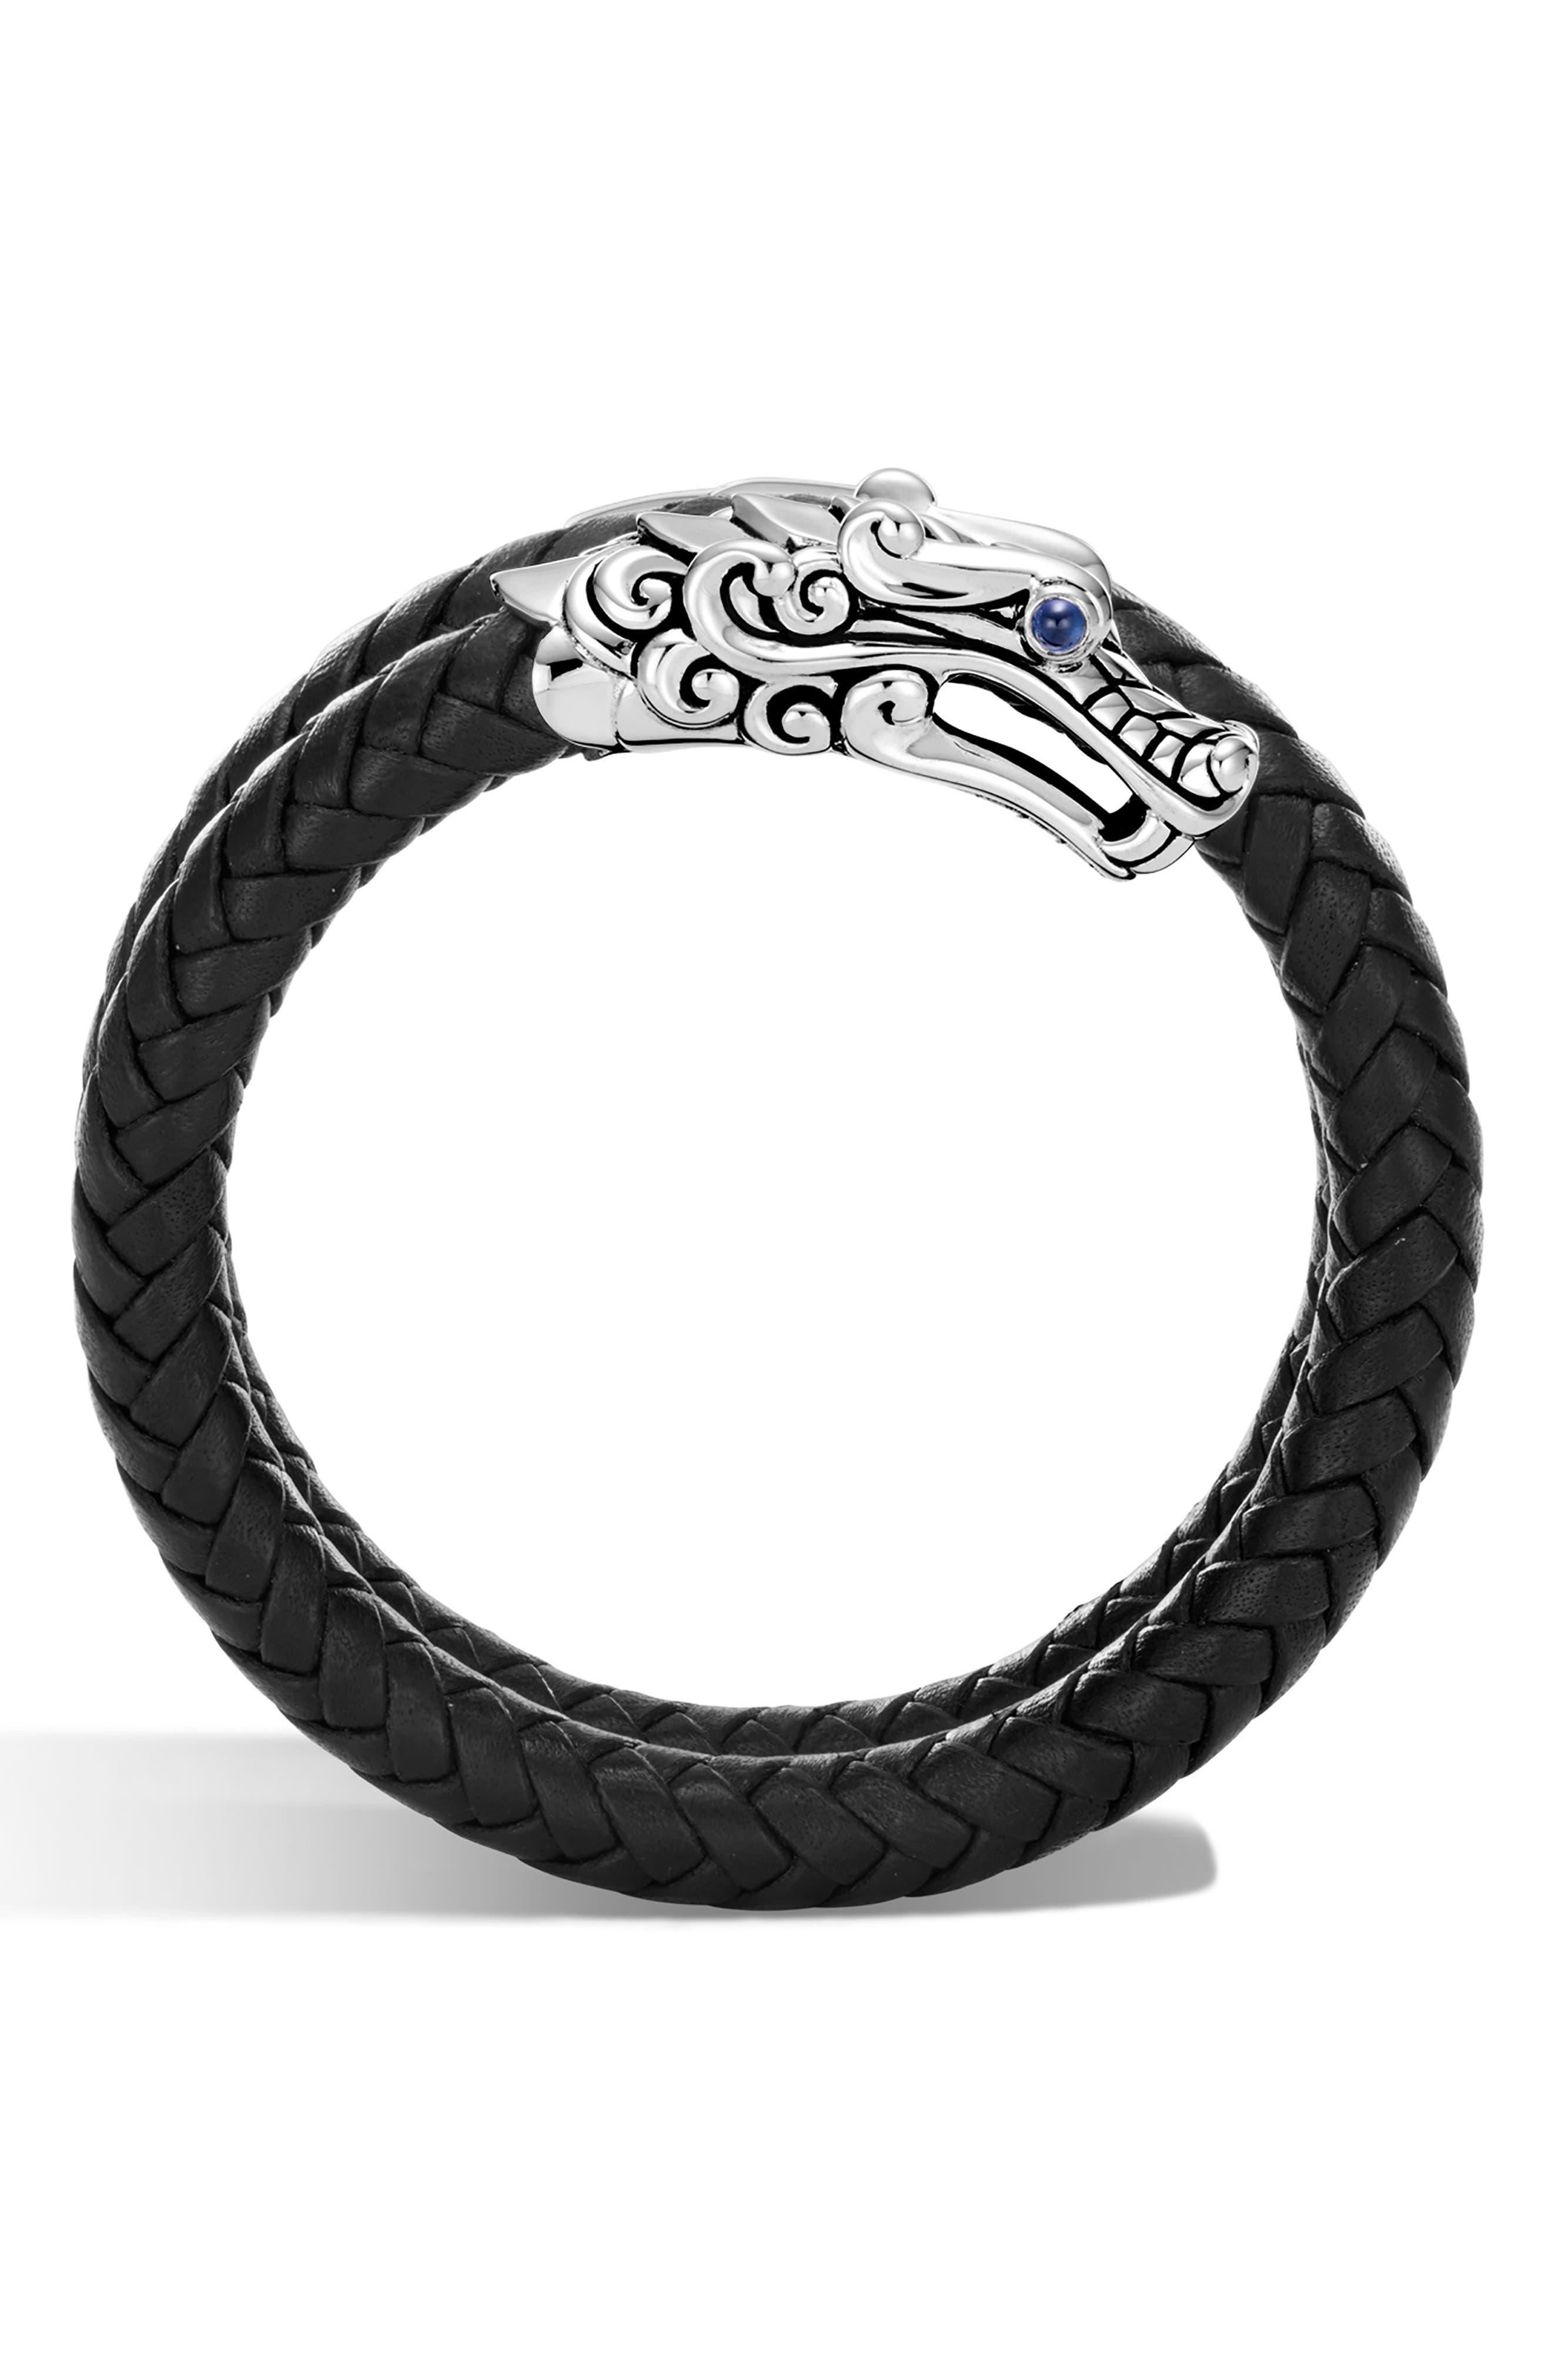 JOHN HARDY, Legends Naga Coiled Leather Bracelet, Main thumbnail 1, color, BLACK